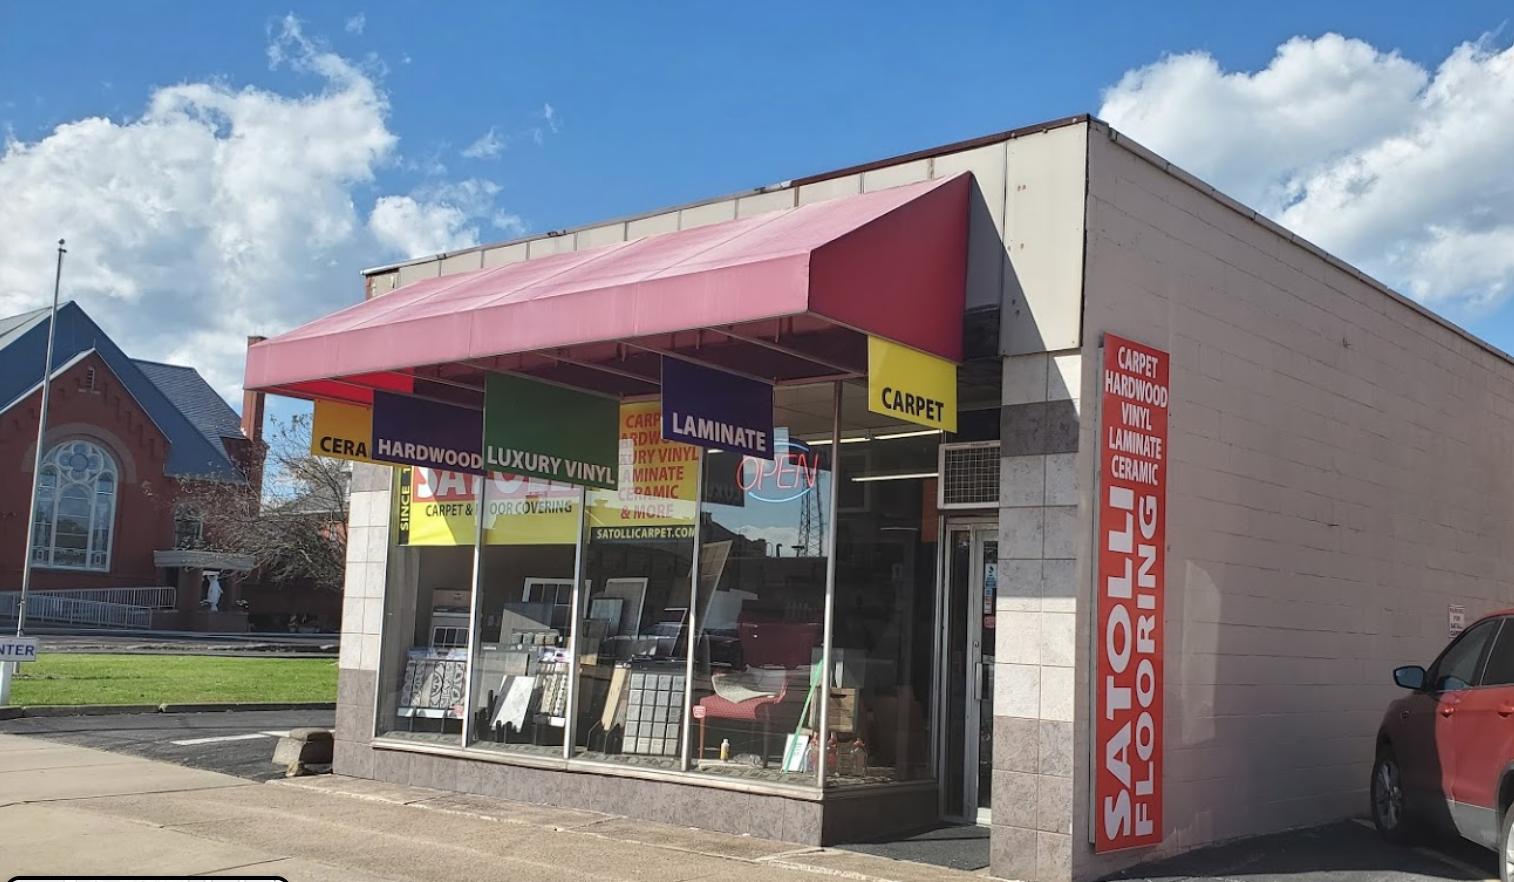 Satolli Carpet & Floor Covering - 361 High St NE, Warren, OH 44481